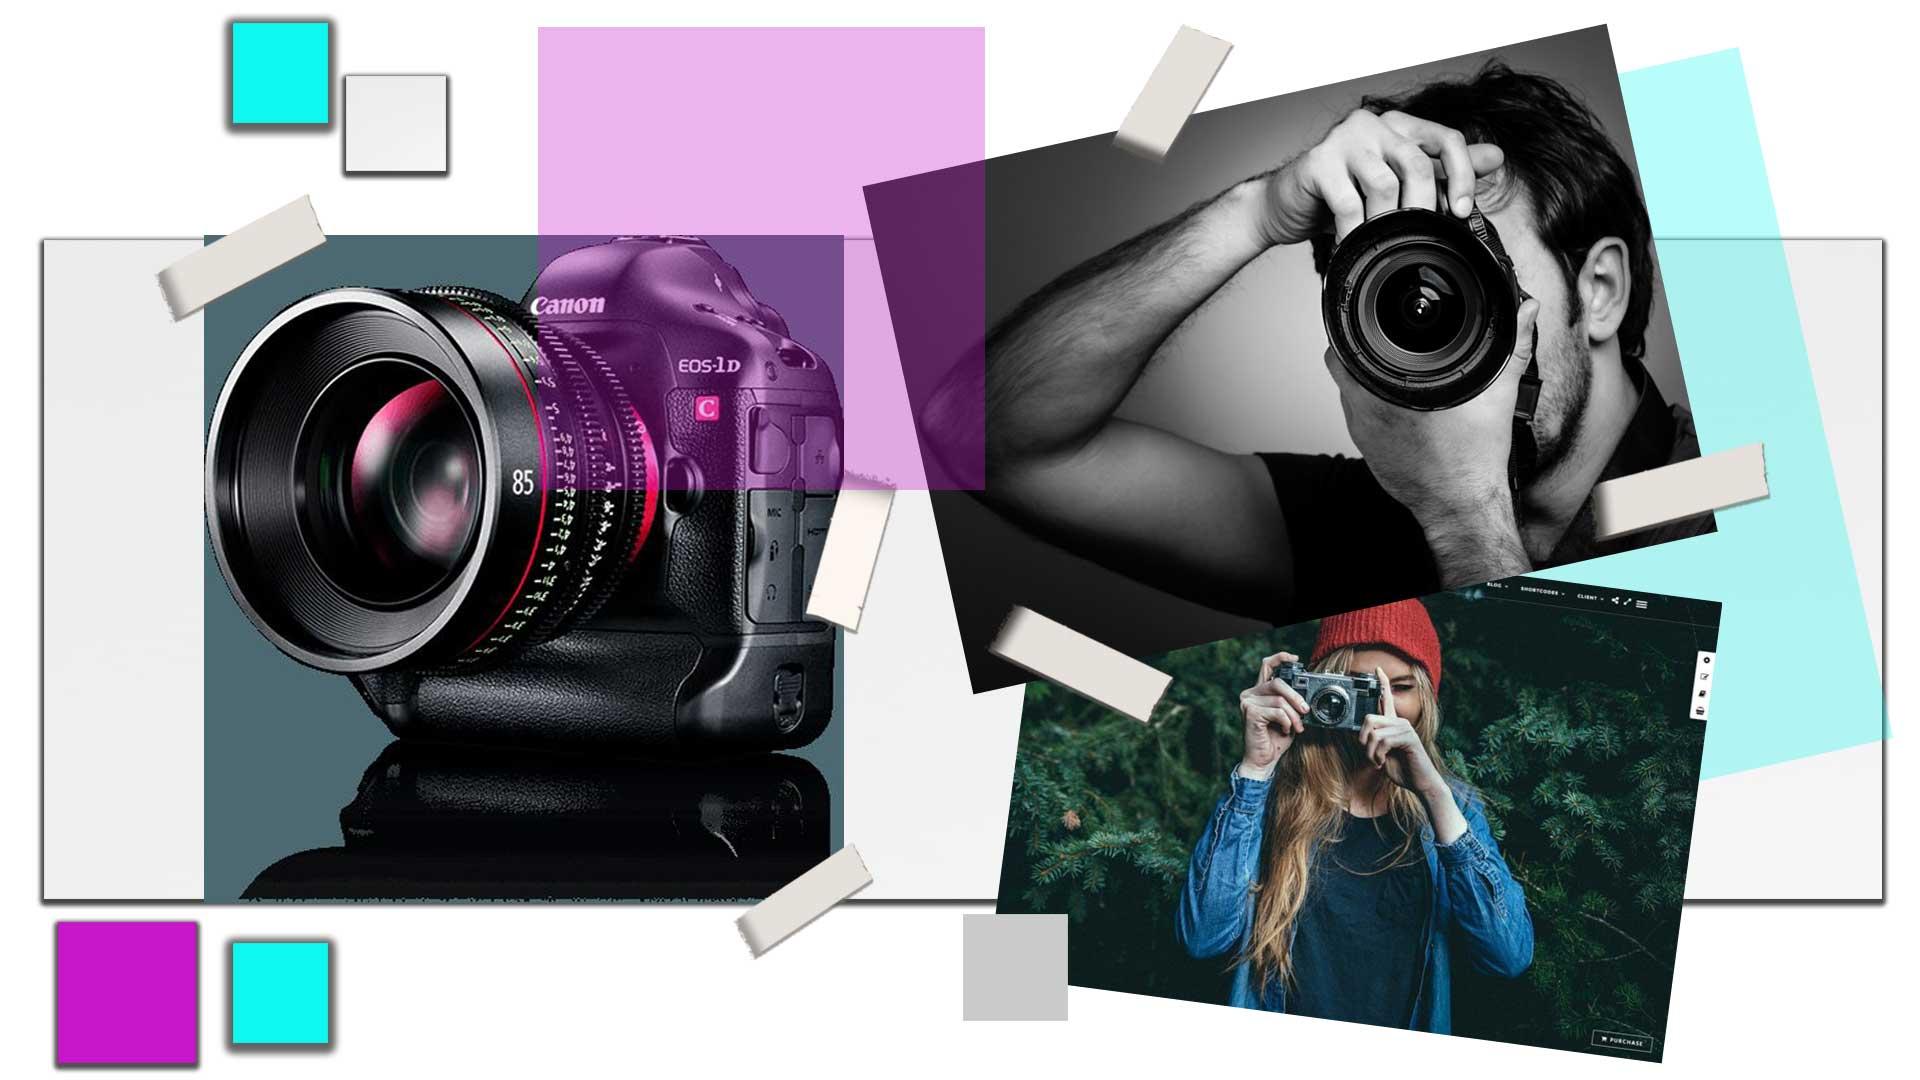 professiona1 photographe 21a - چگونه میتوان حرفه عکاسی را برای همیشه داشت ؟